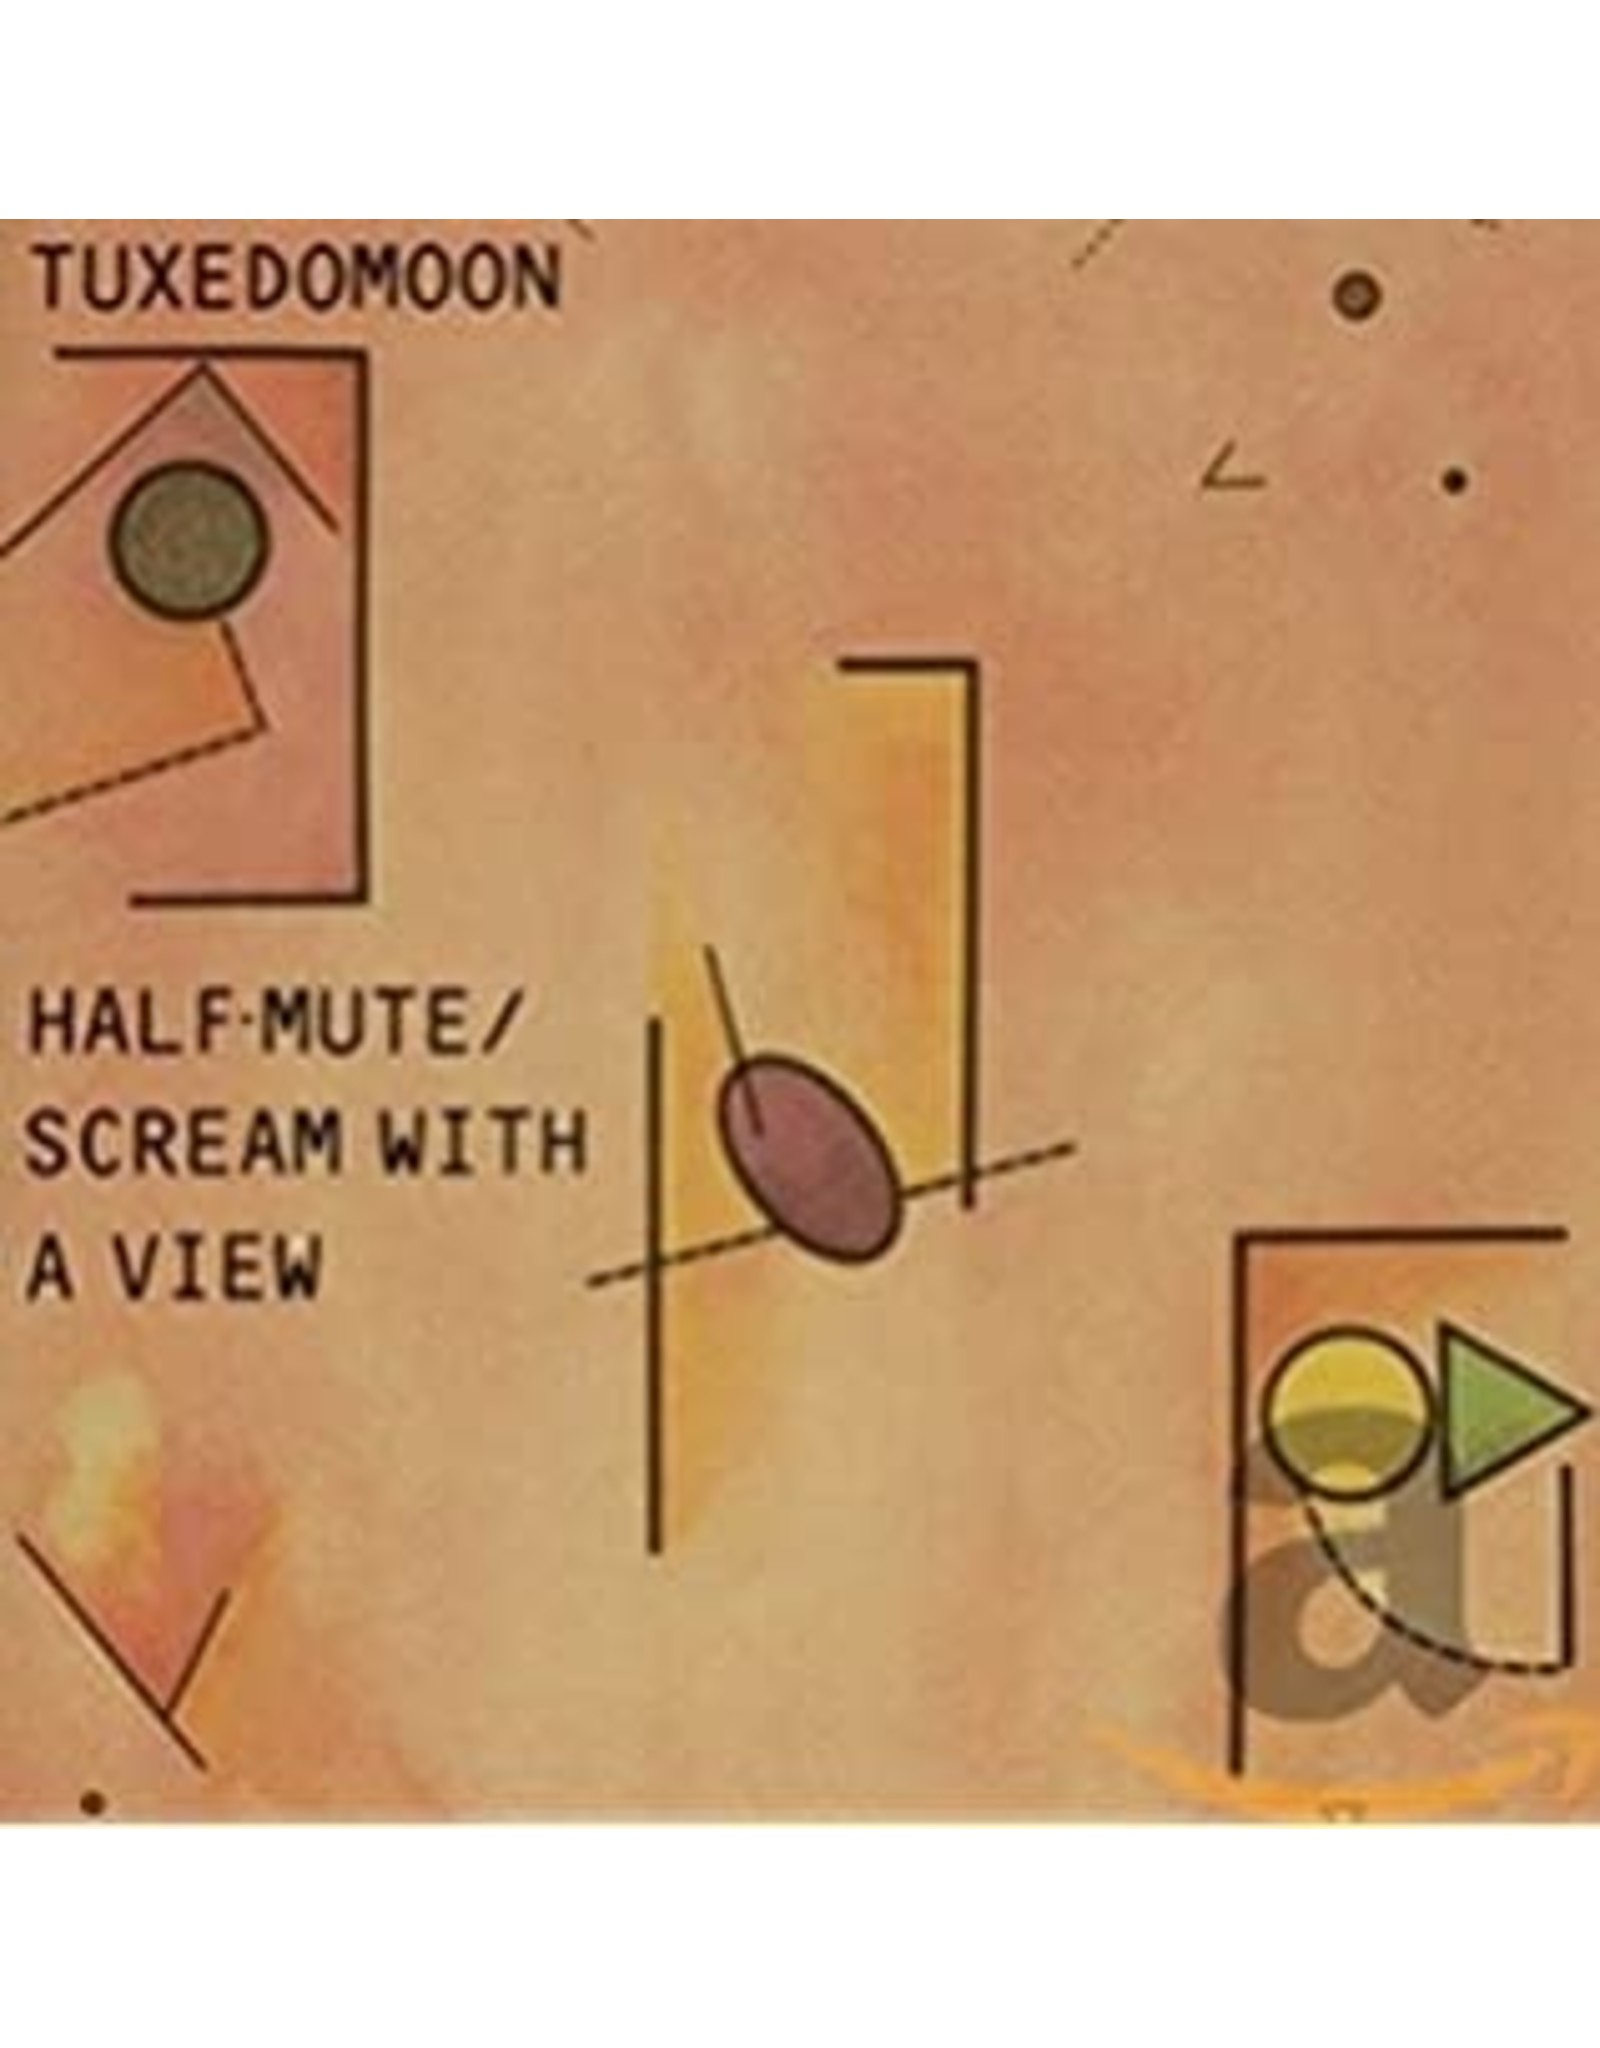 New Vinyl Tuxedomoon - Half-Mute LP